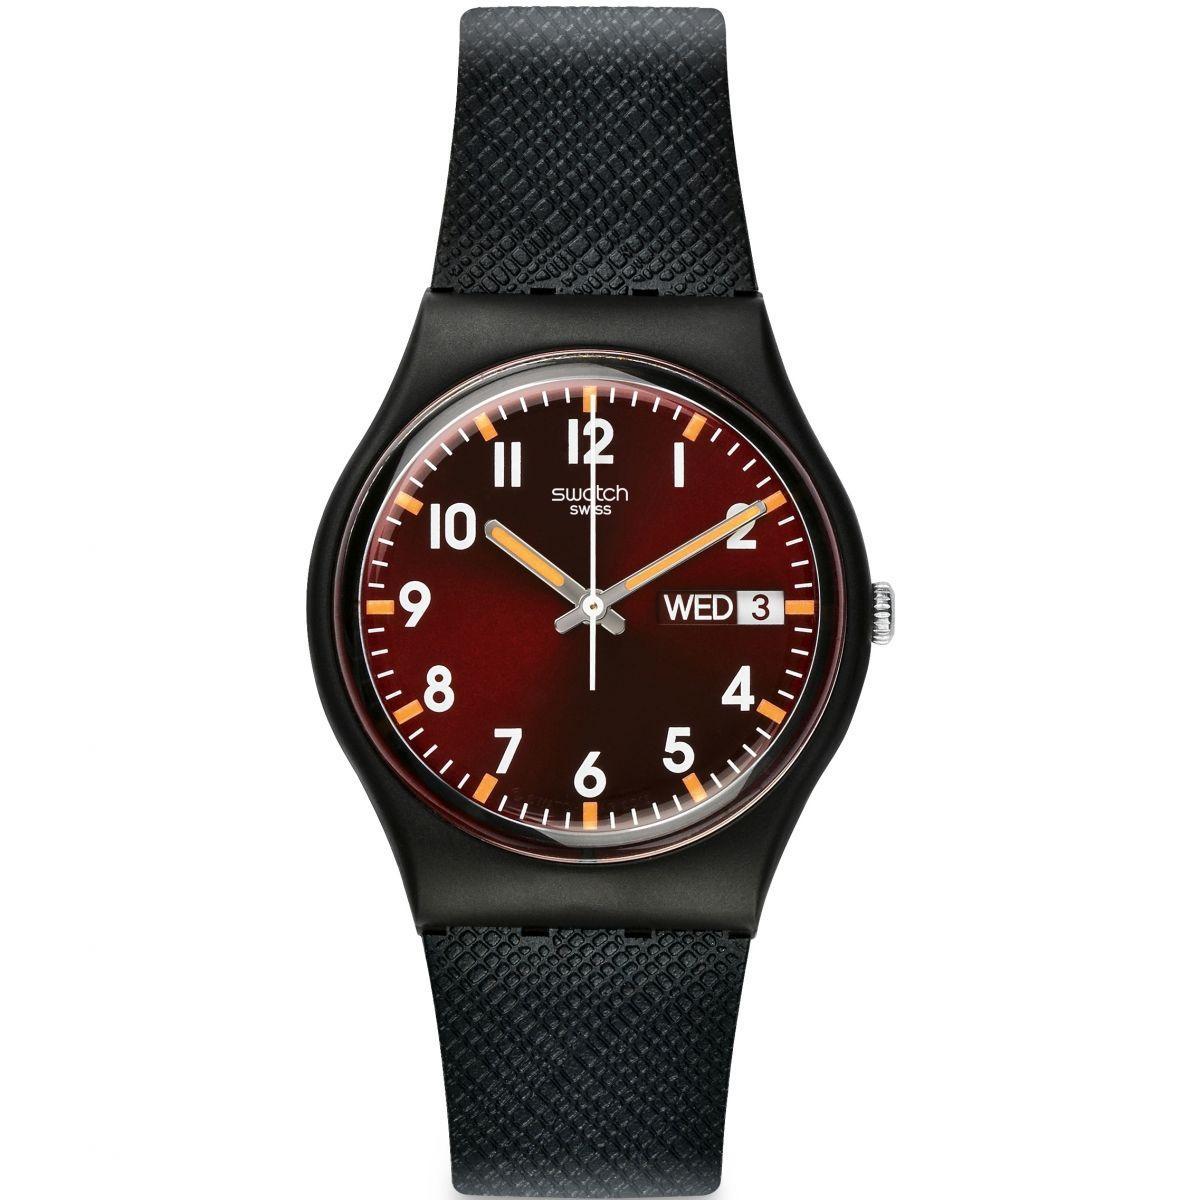 Swatch - Jam Tangan Pria - Hitam - Rubber Hitam - GB753 ef259b71ef